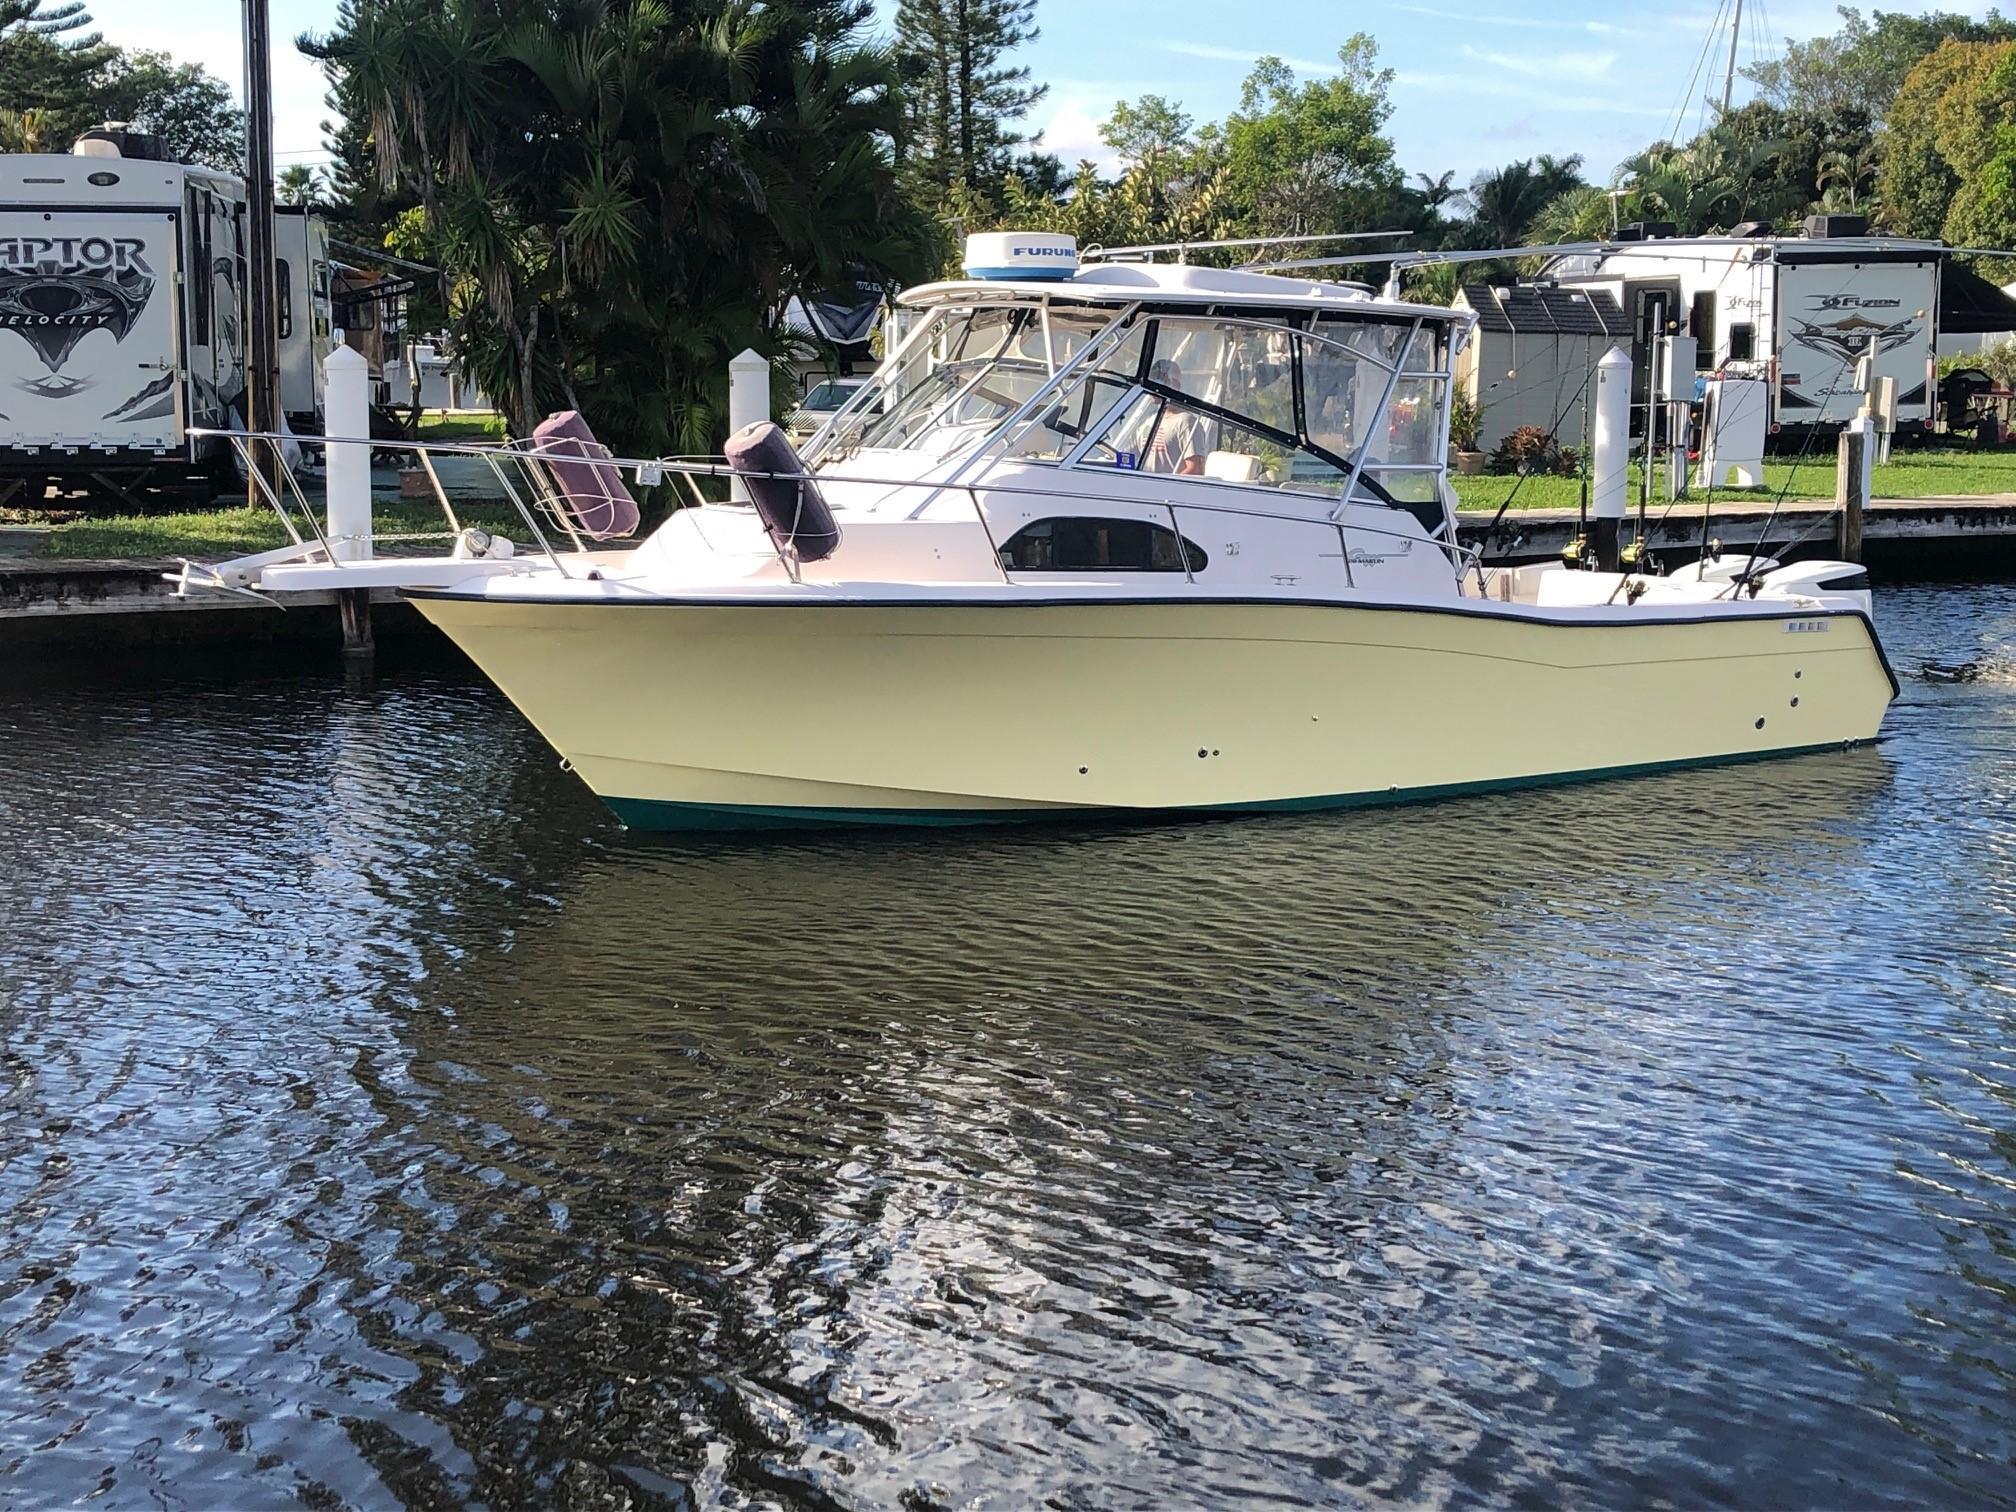 30 Grady-White Marlin 300